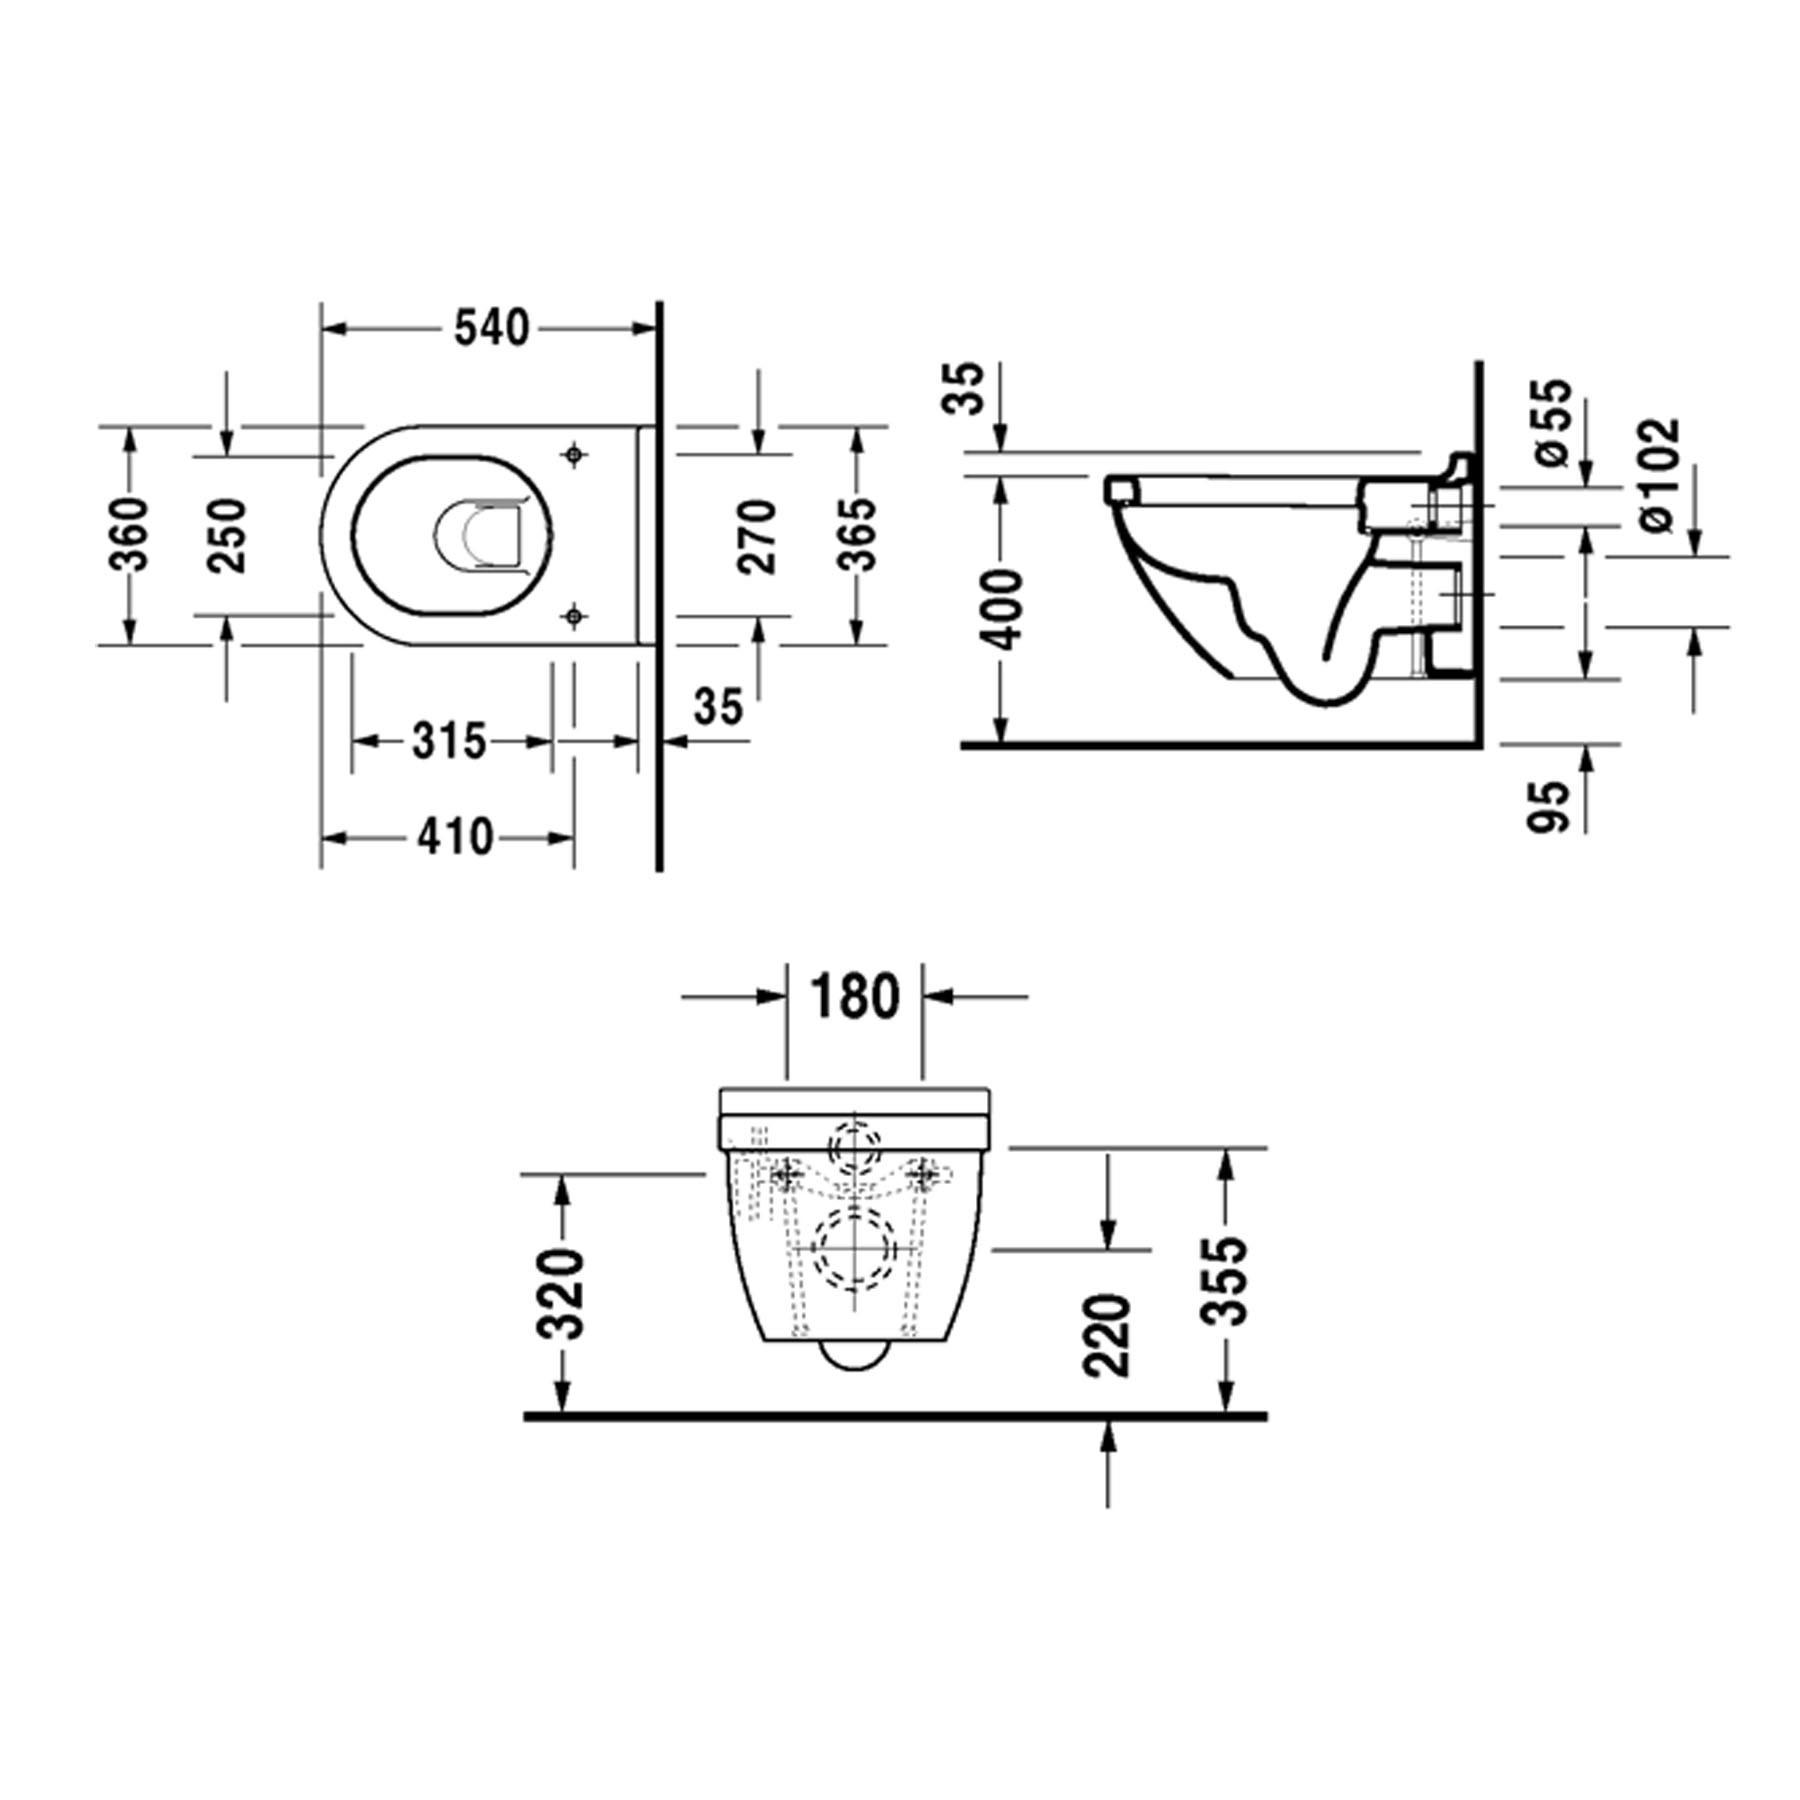 DU WWC-Set Starck 3, Tiefspüler DuraFix weiß, inkl. WC-Sitz mit Absenkautomatik